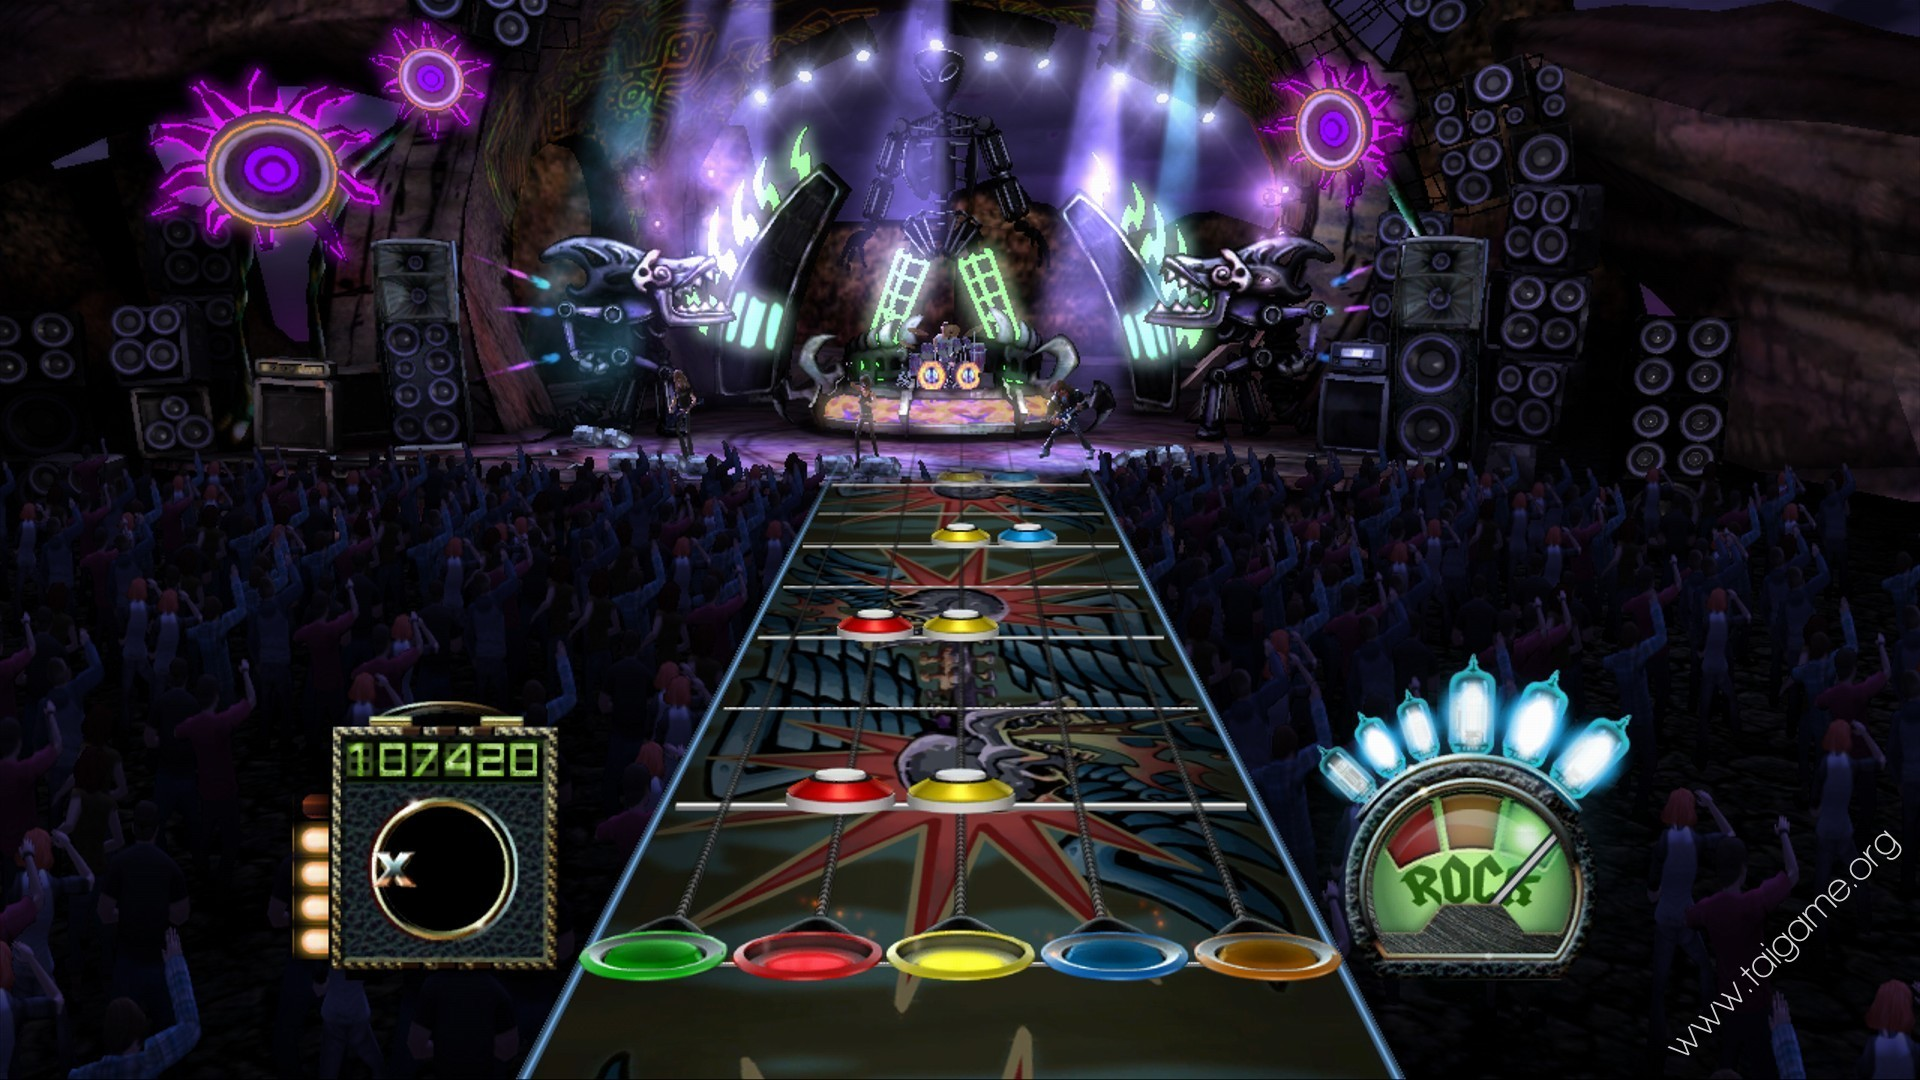 guitar hero iii legends of rock download free full games others games. Black Bedroom Furniture Sets. Home Design Ideas